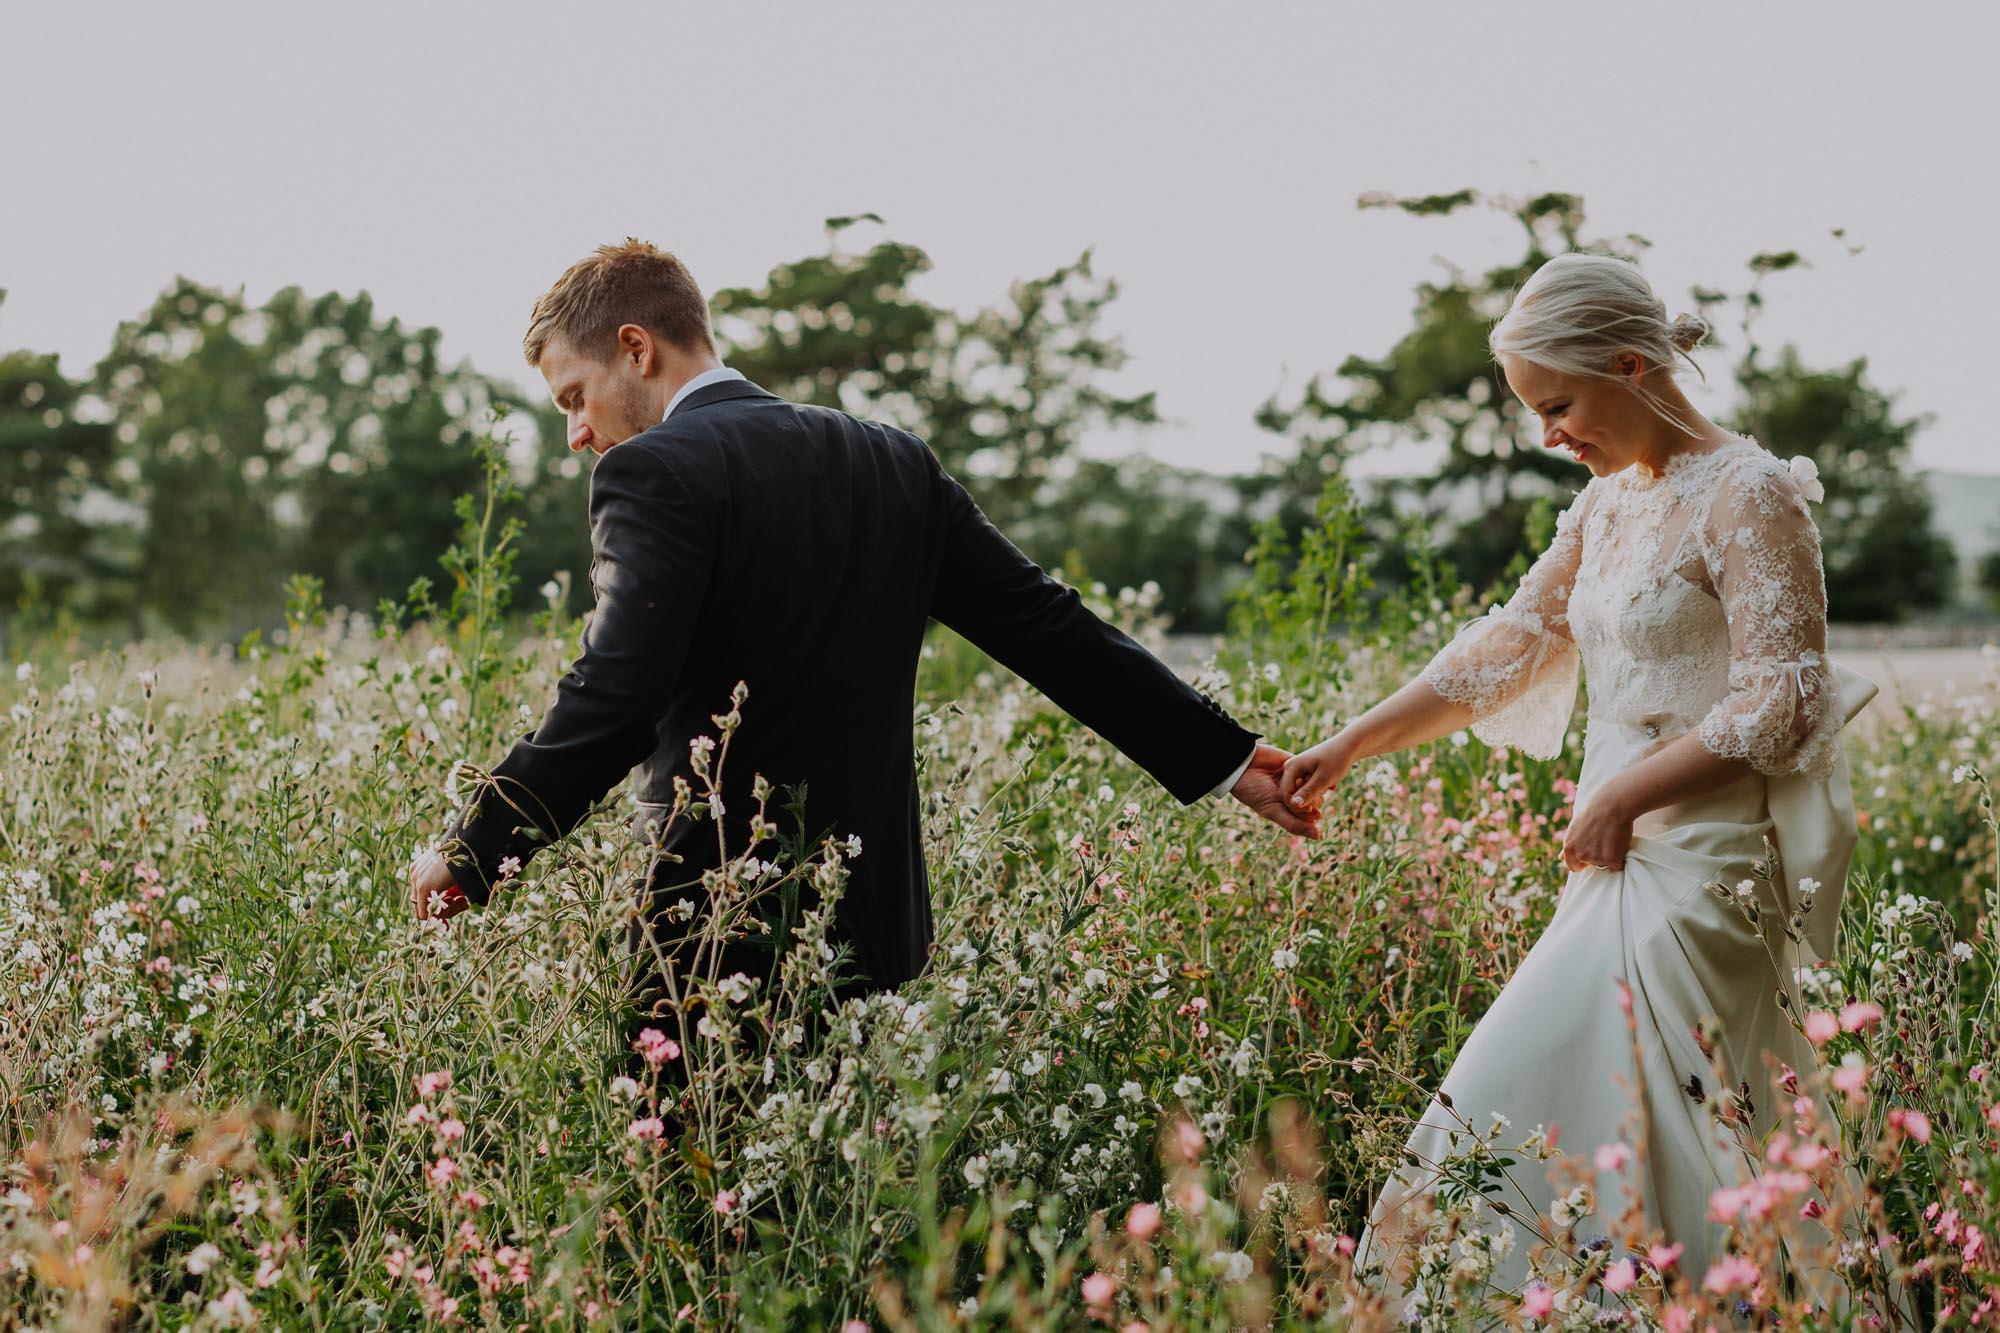 field of flowers holding hands wedding dress